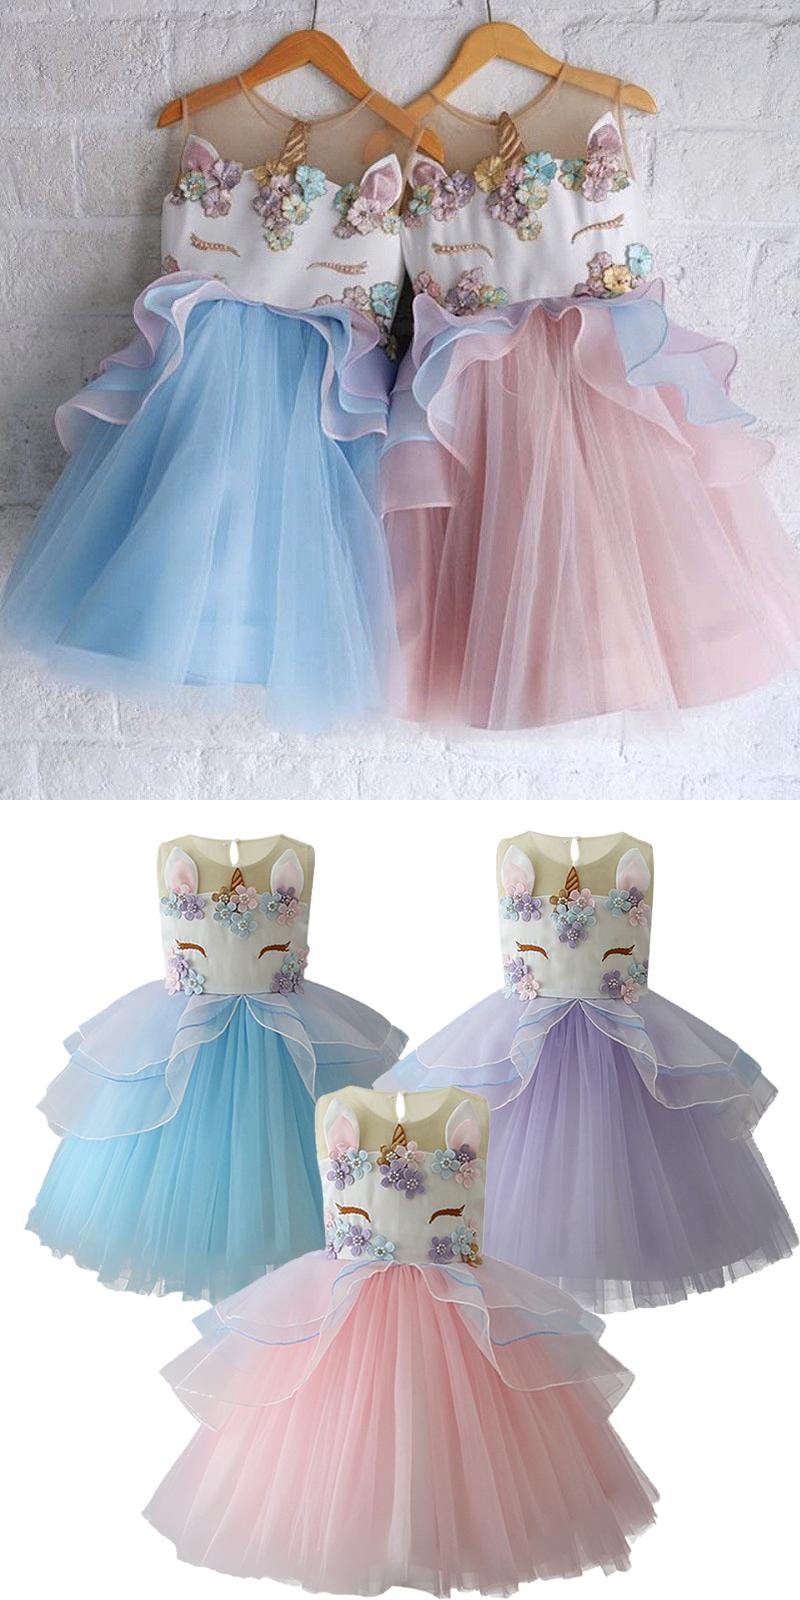 Original unicorn birthday dress party ideas also in katys th rh pinterest